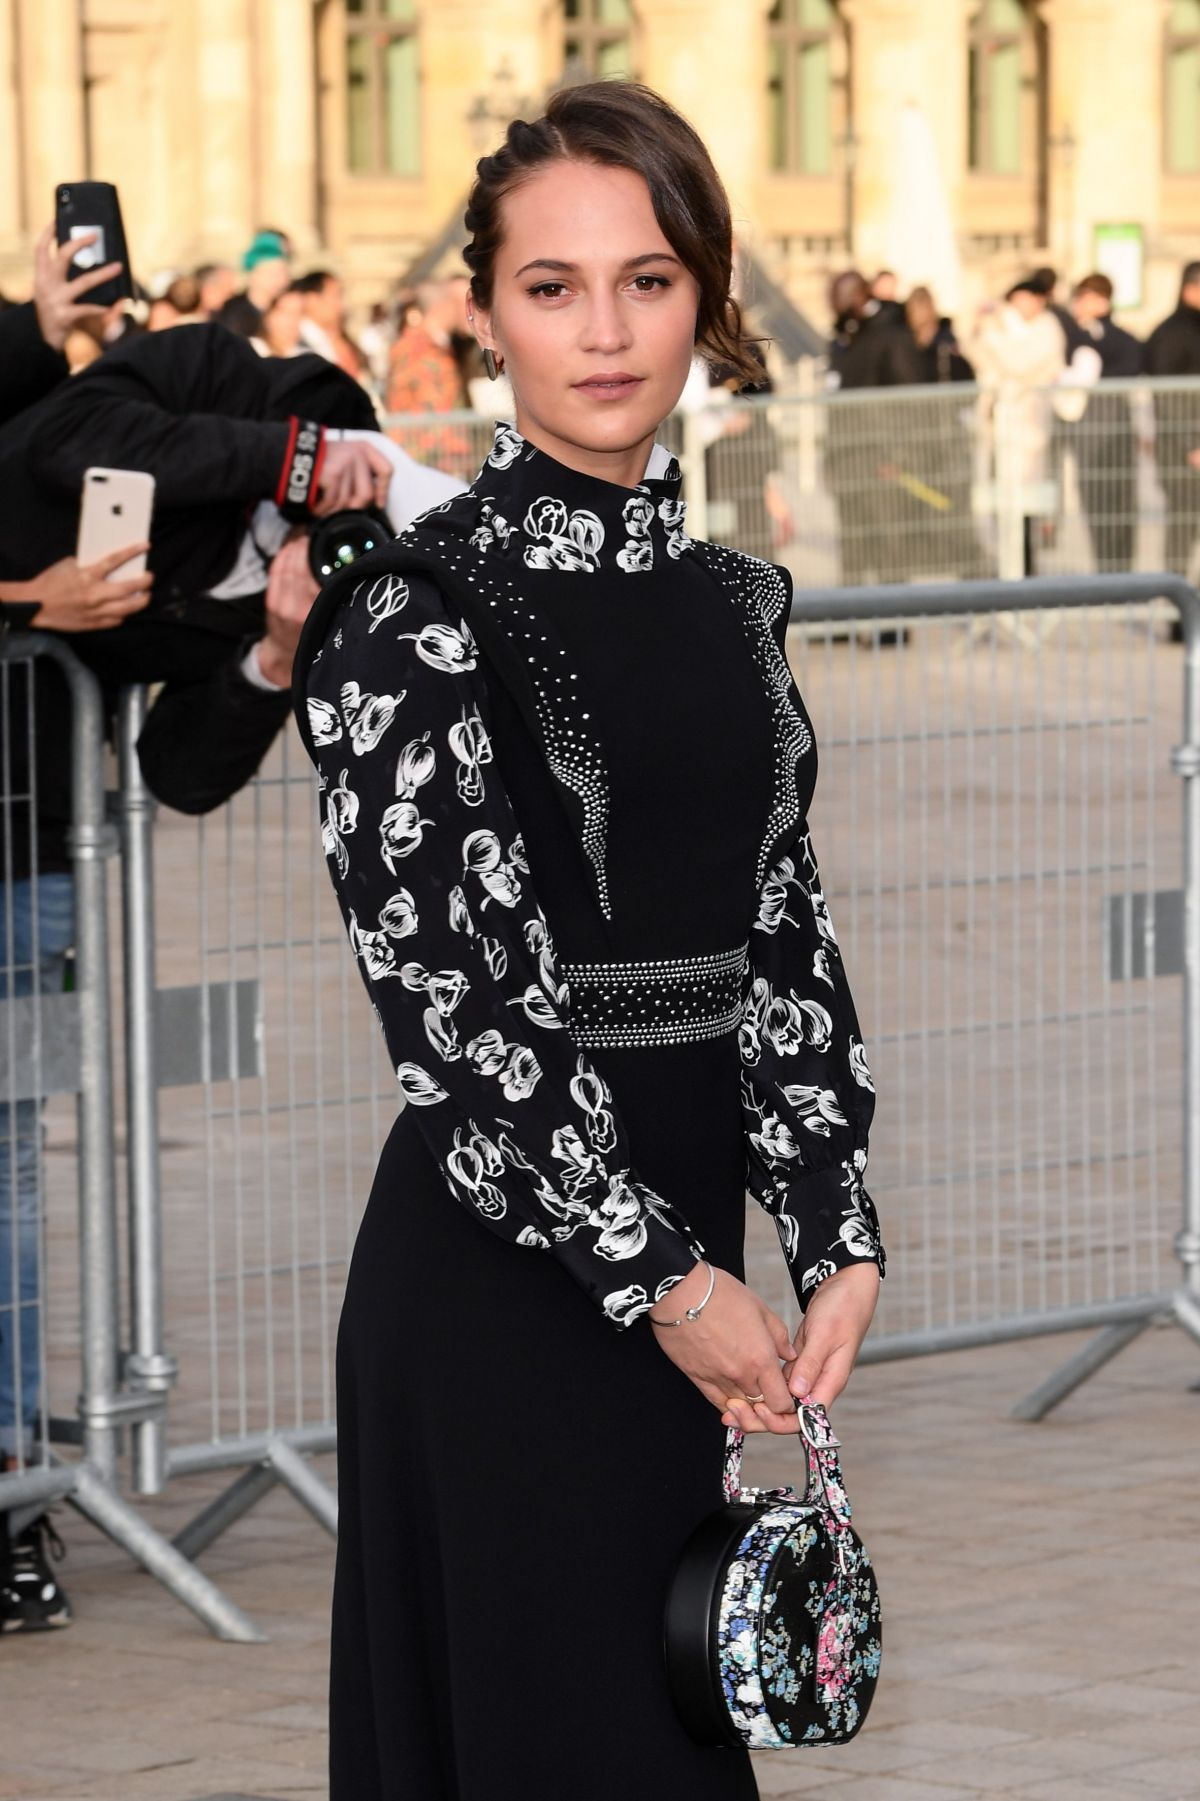 Alicia Vikander At Louis Vuitton Show At Paris Fashion Week 03 05